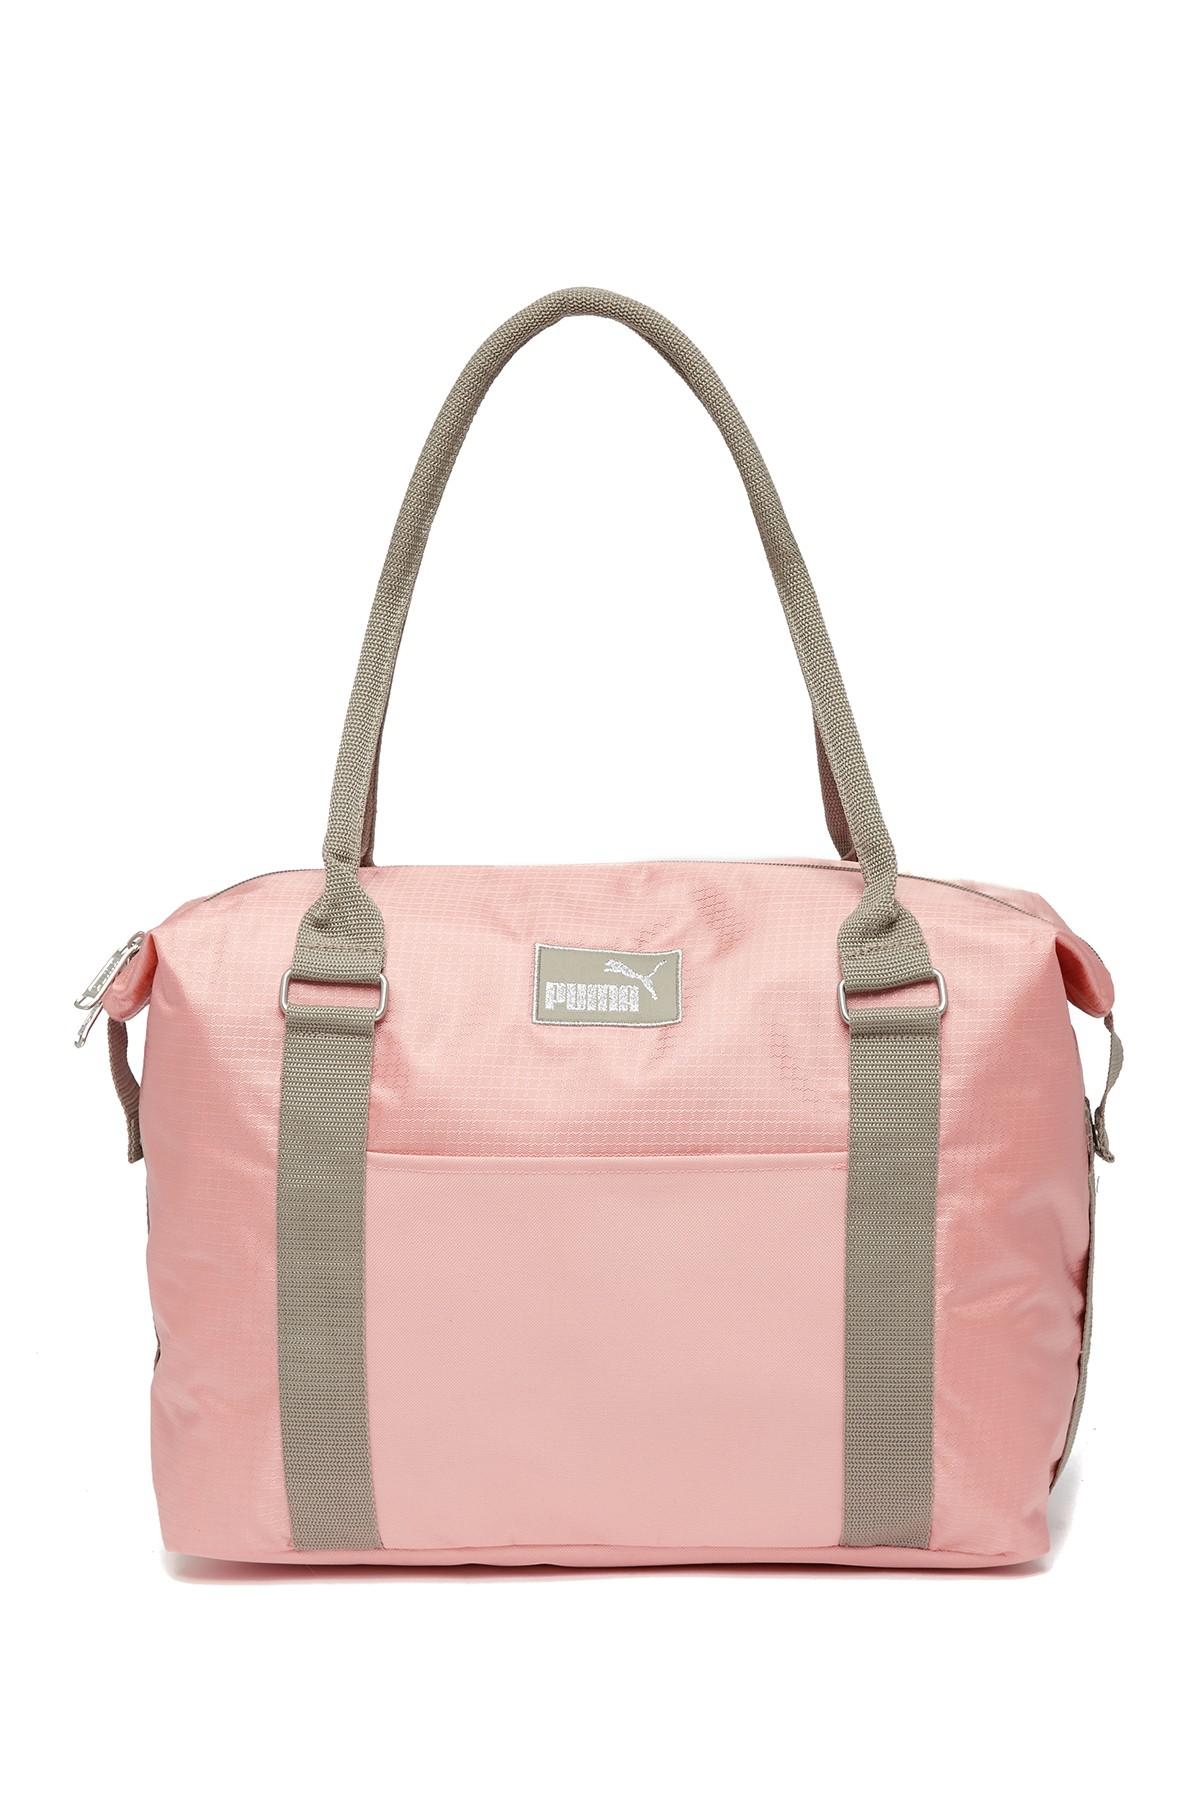 f8cdf5b25d Lyst - PUMA Evercat Jane Tote in Pink